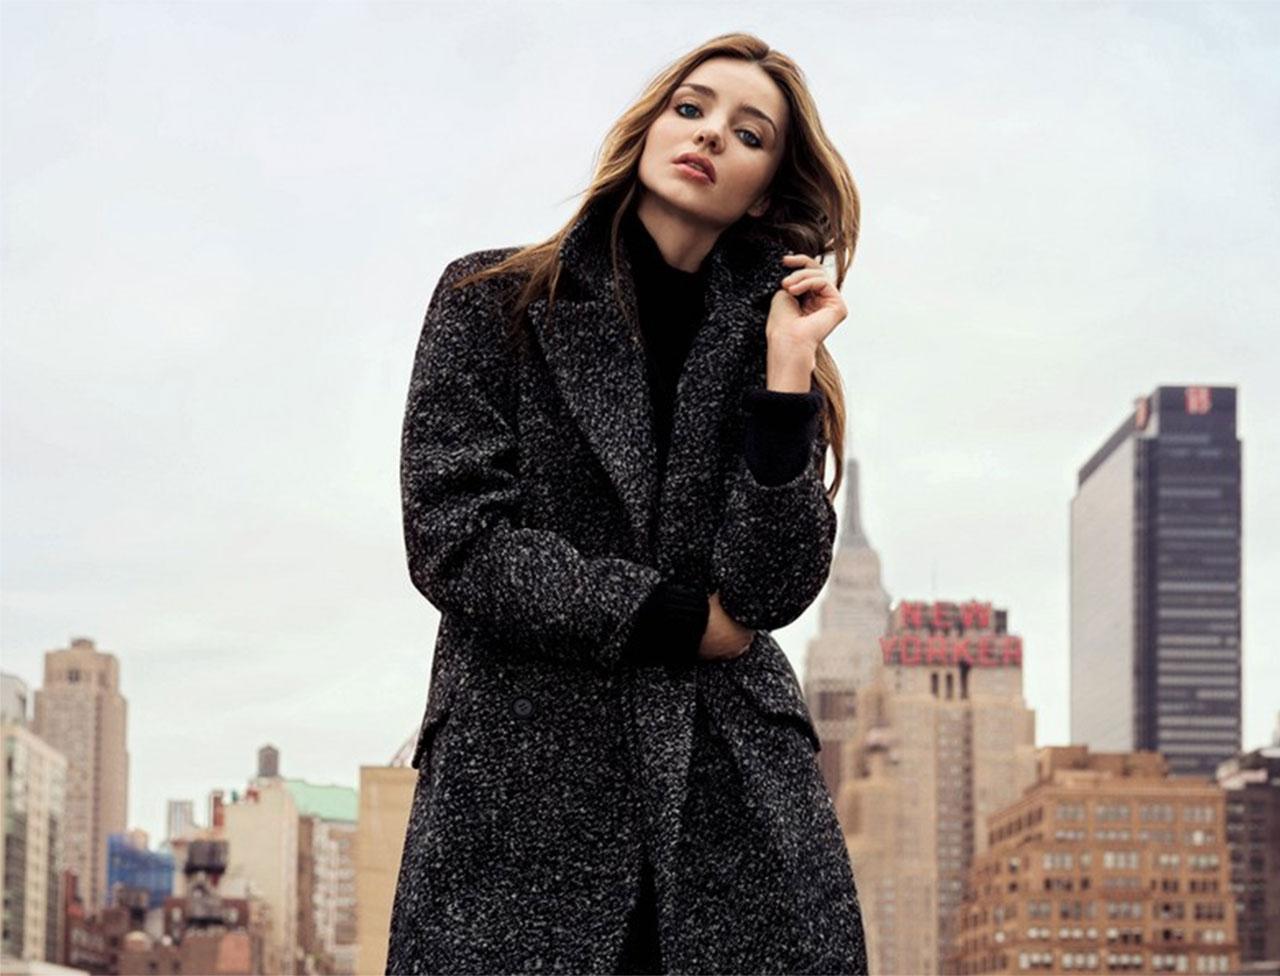 manteau chaud femme les diff rents mat riaux qui font la. Black Bedroom Furniture Sets. Home Design Ideas